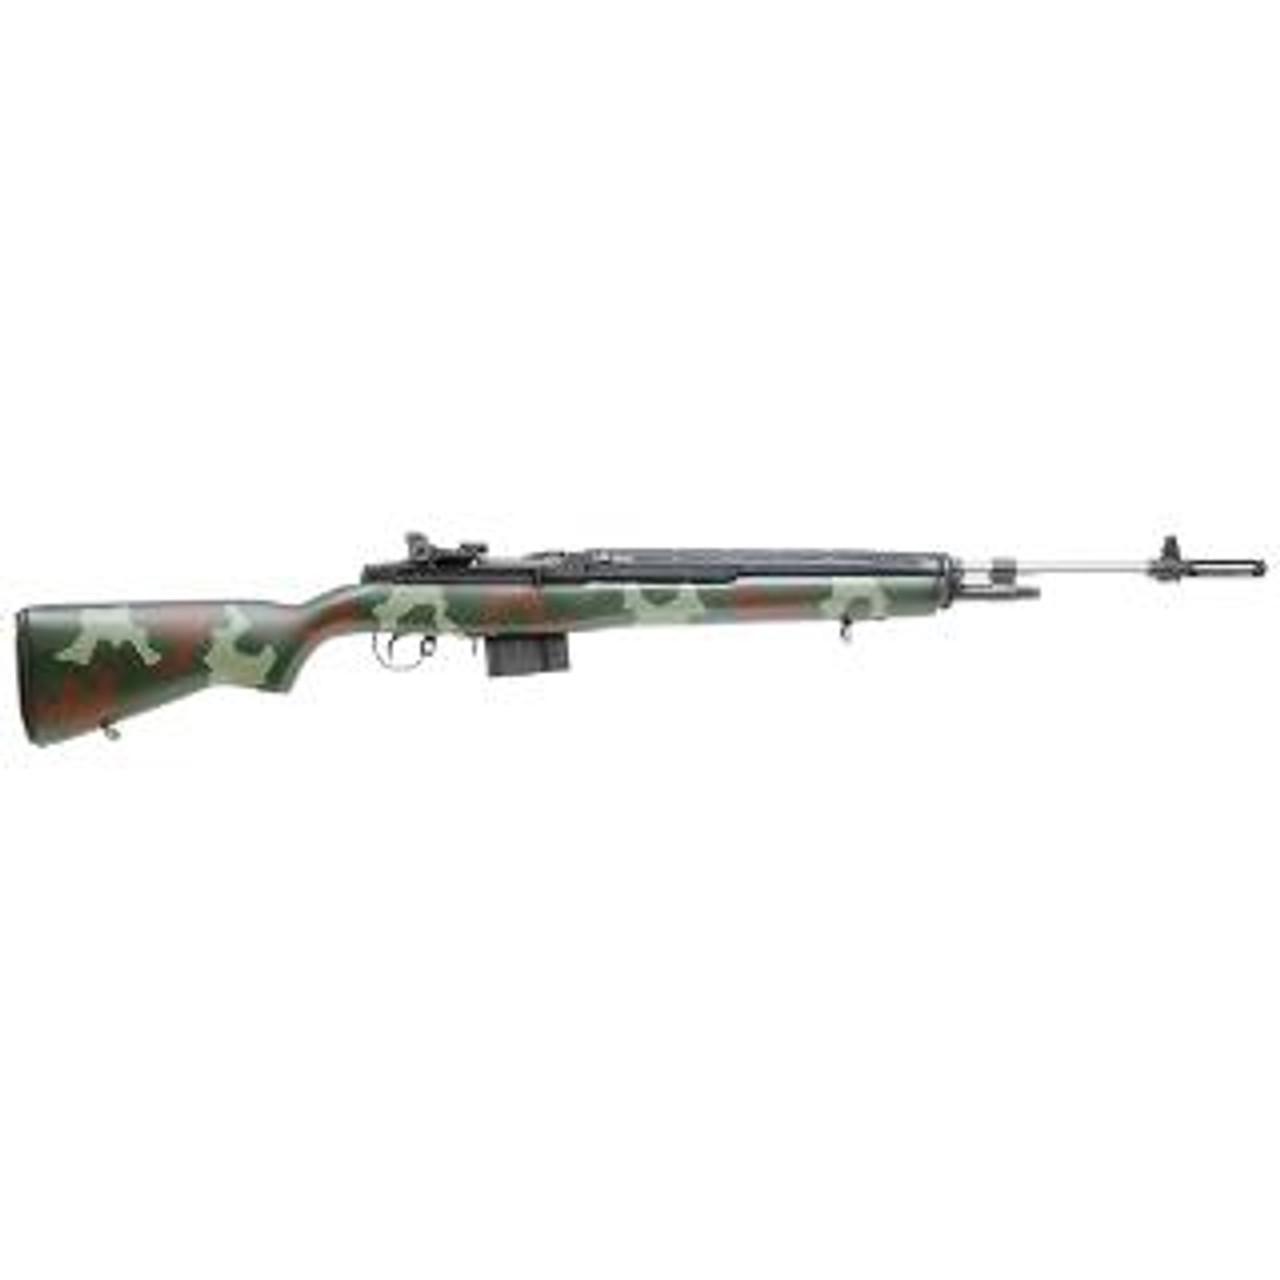 Springfield M1A Super Match SS CALIFORNIA LEGAL - .308/7.62x51 - Green Camo